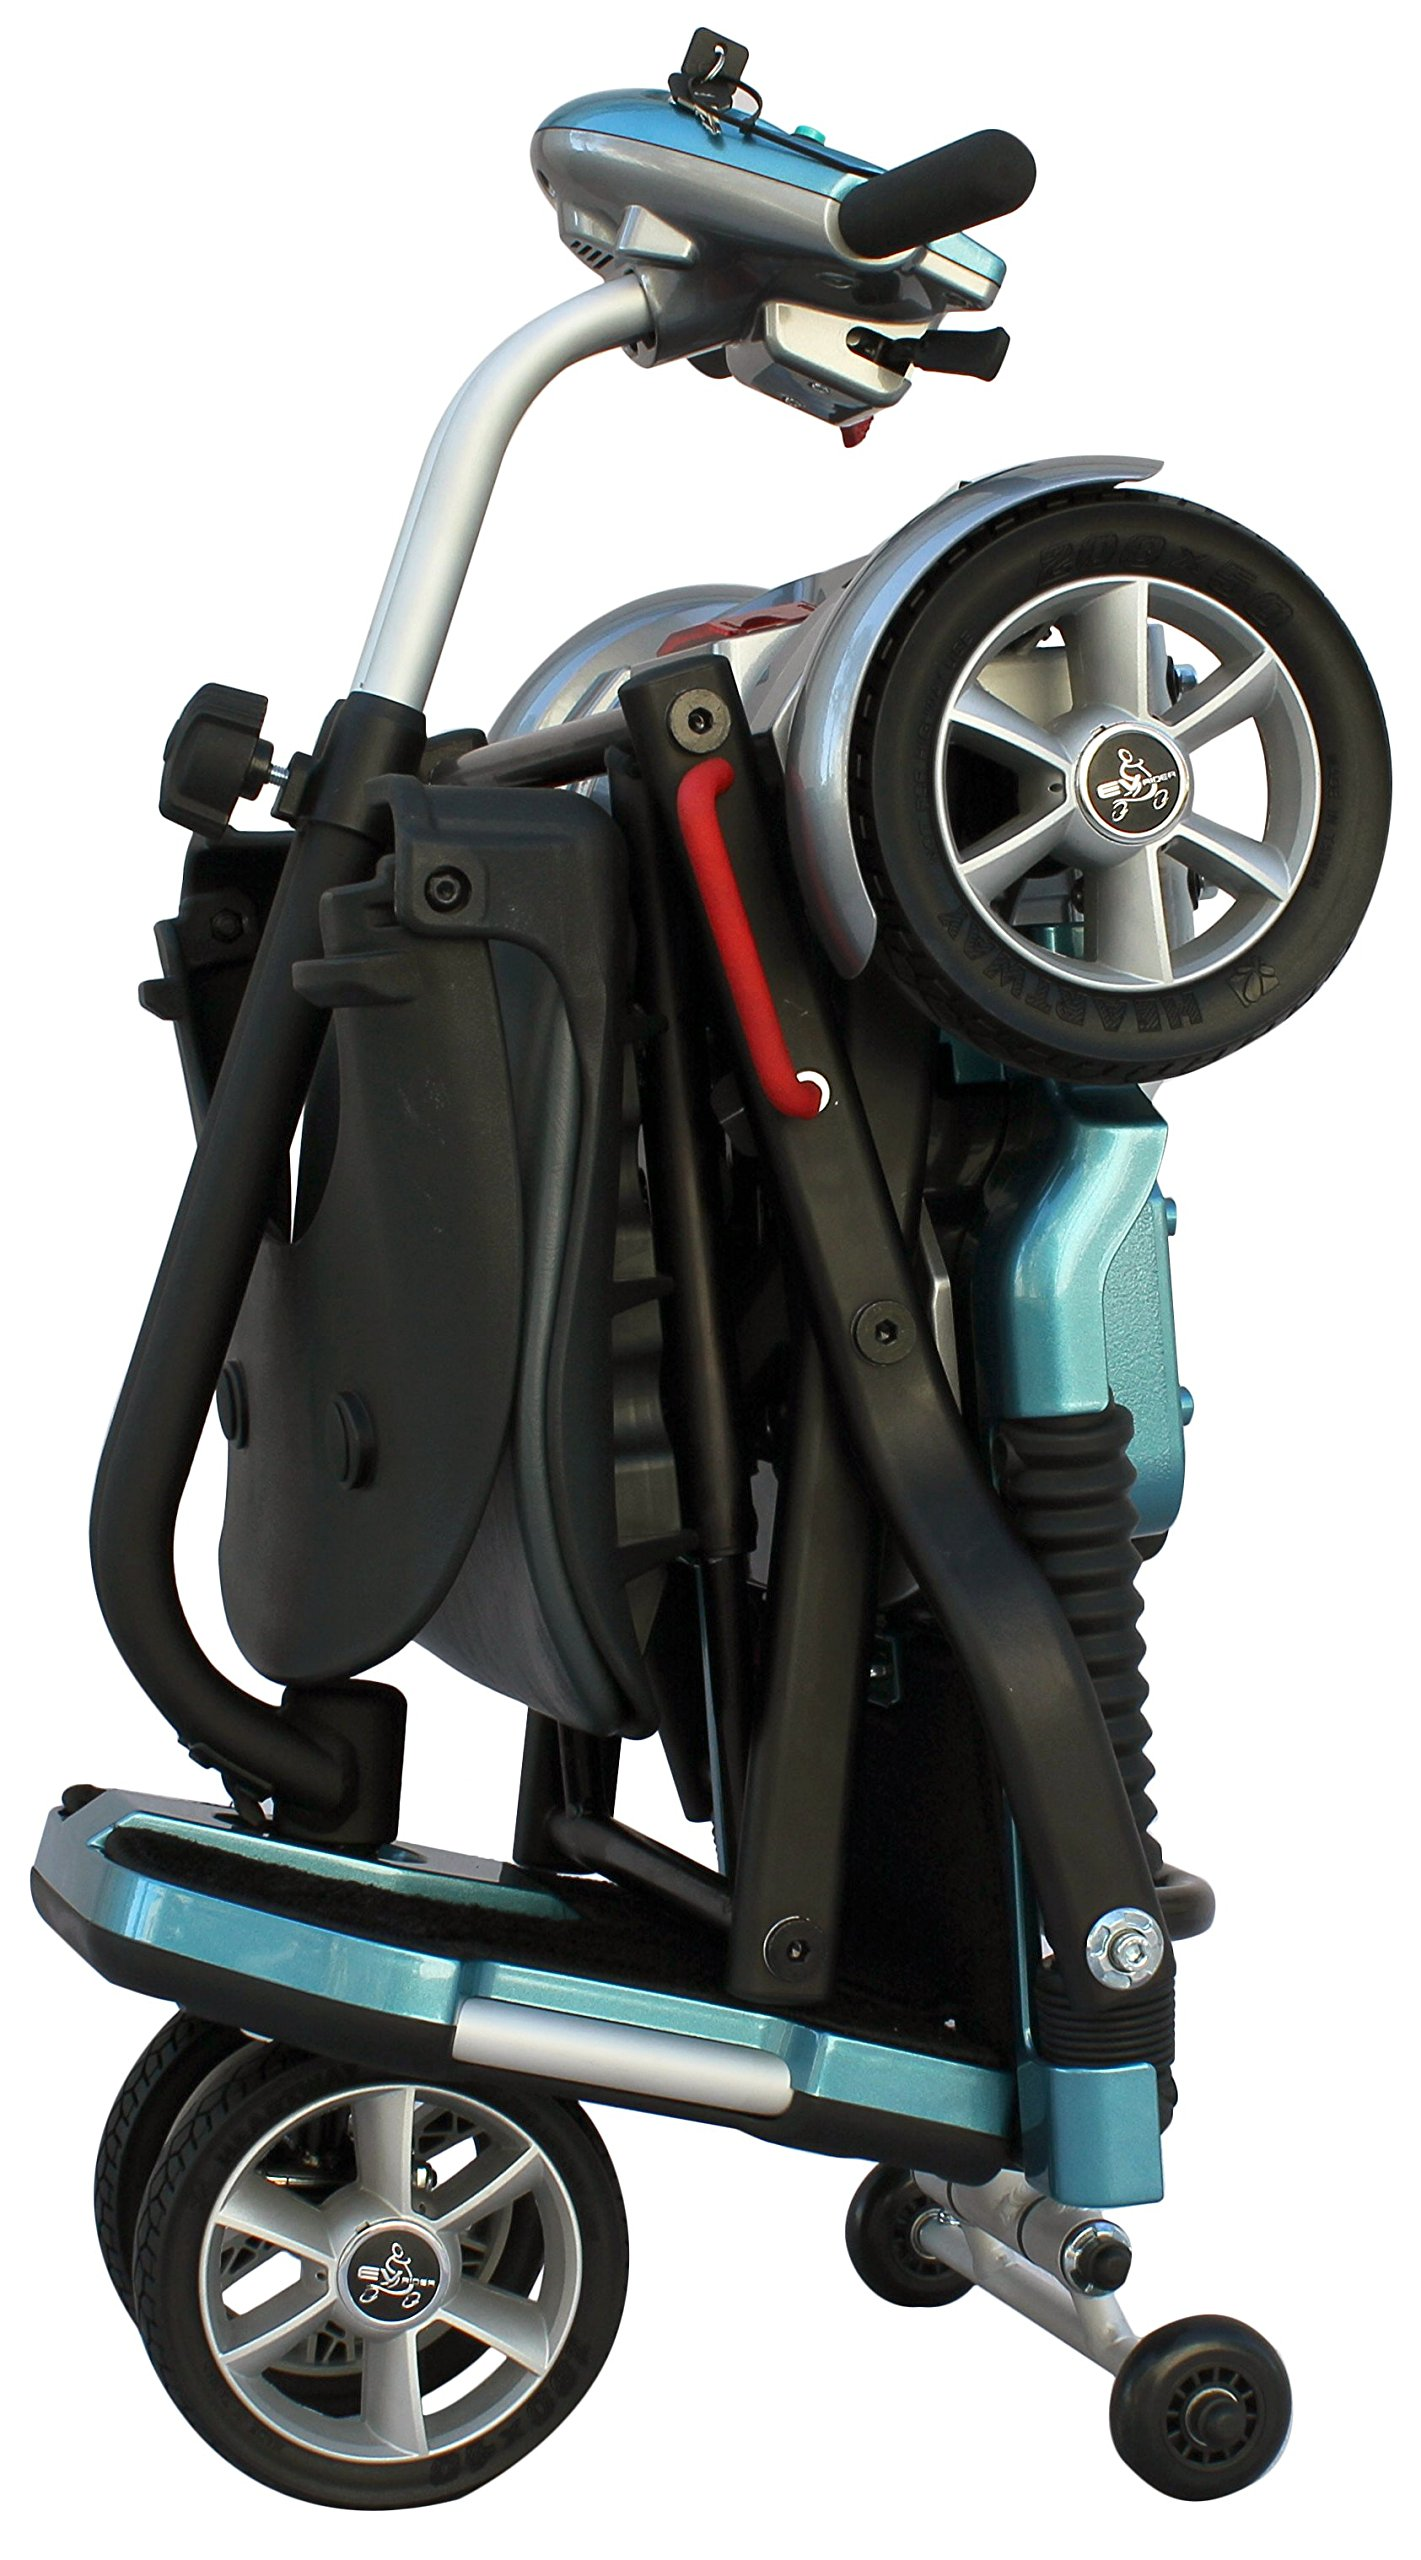 EV Rider Transport Folding Lightweight Travel Mobility Scooter Demo Model